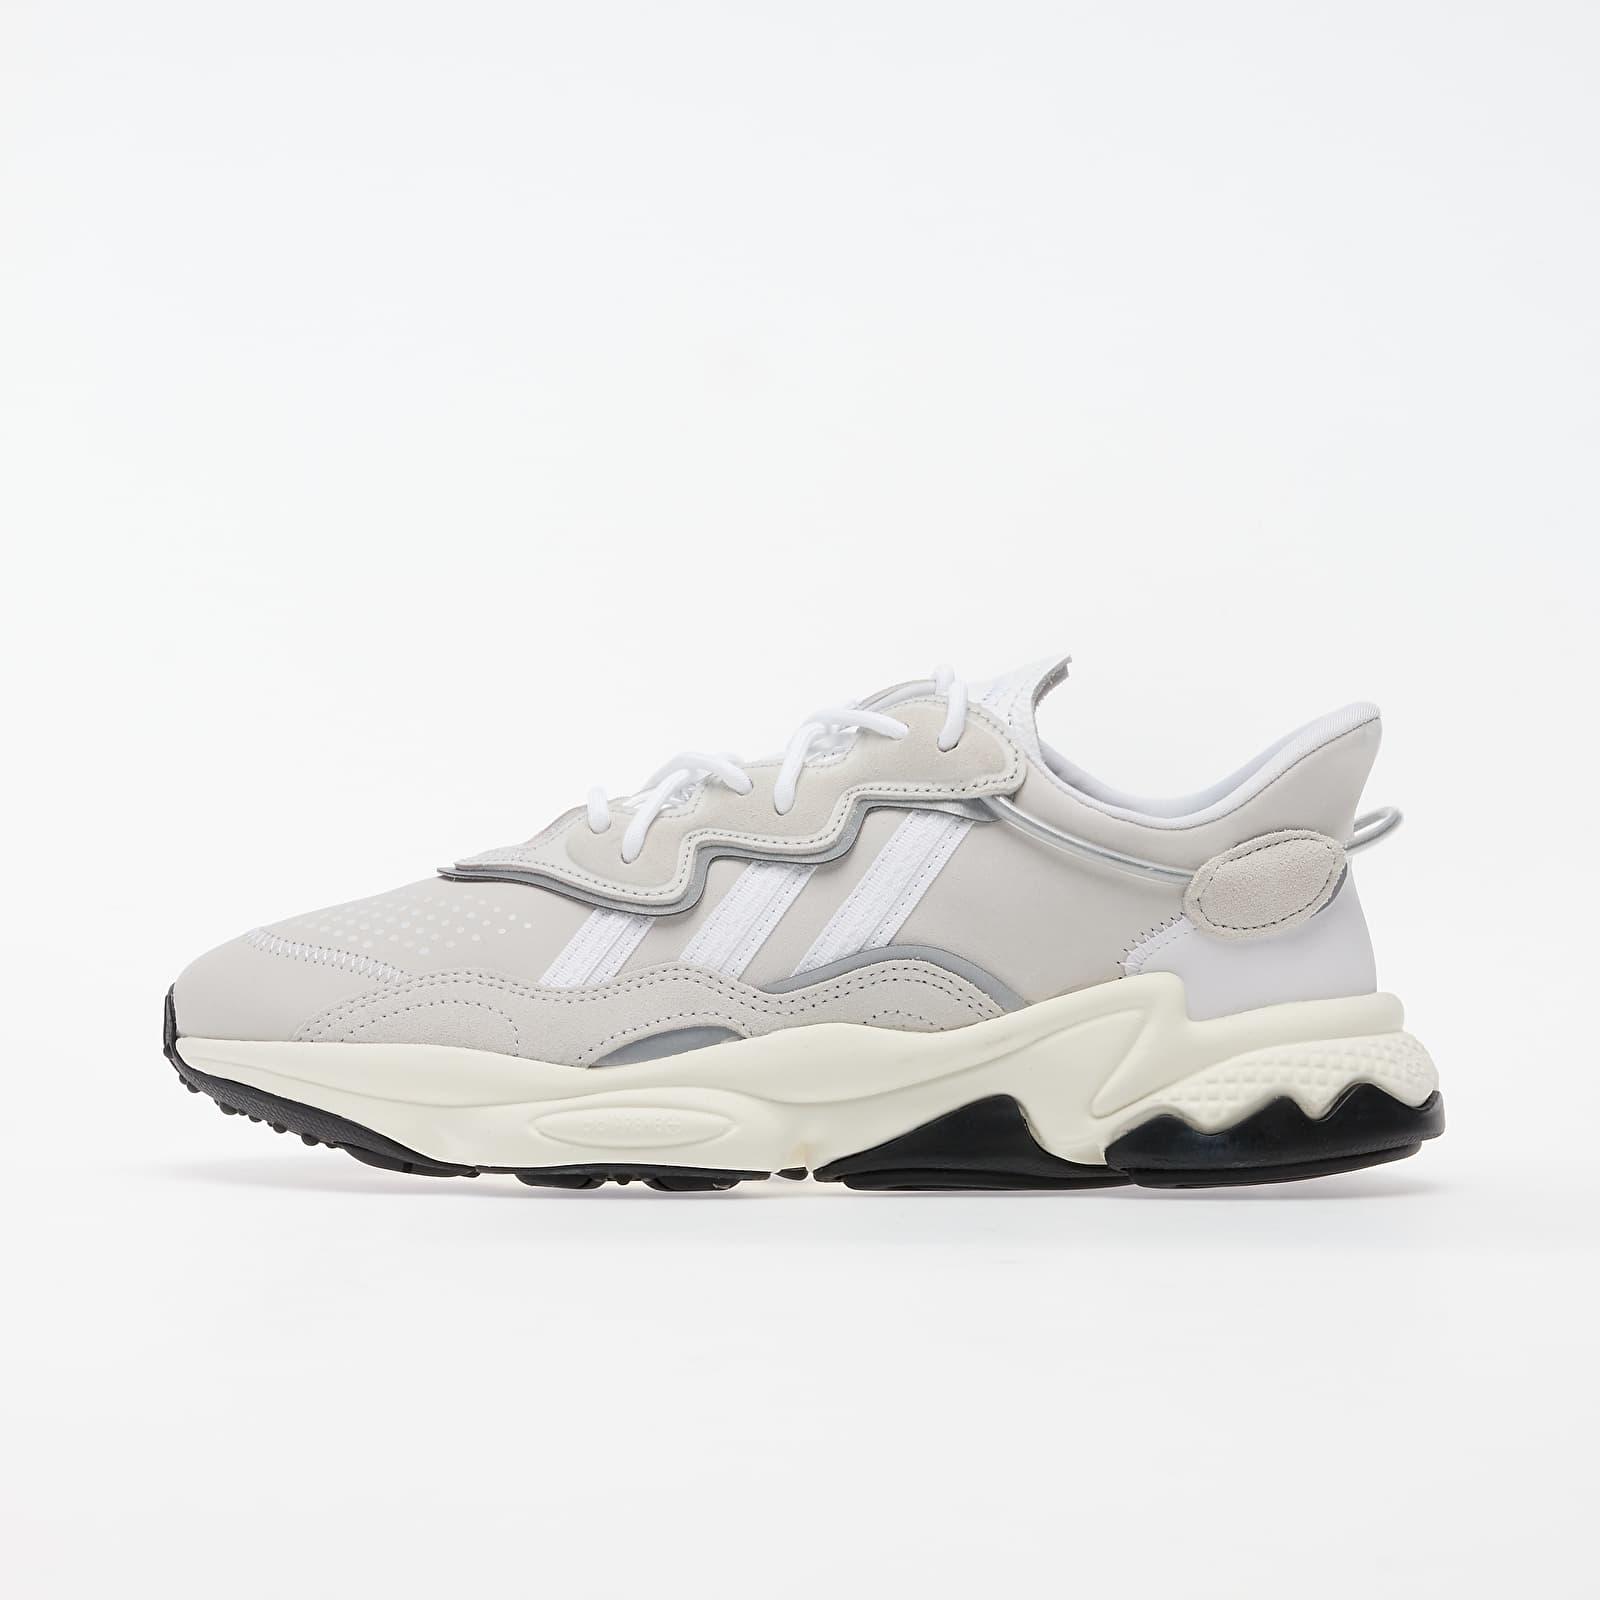 Men's shoes adidas Ozweego Crystal White/ Ftw White/ Off White